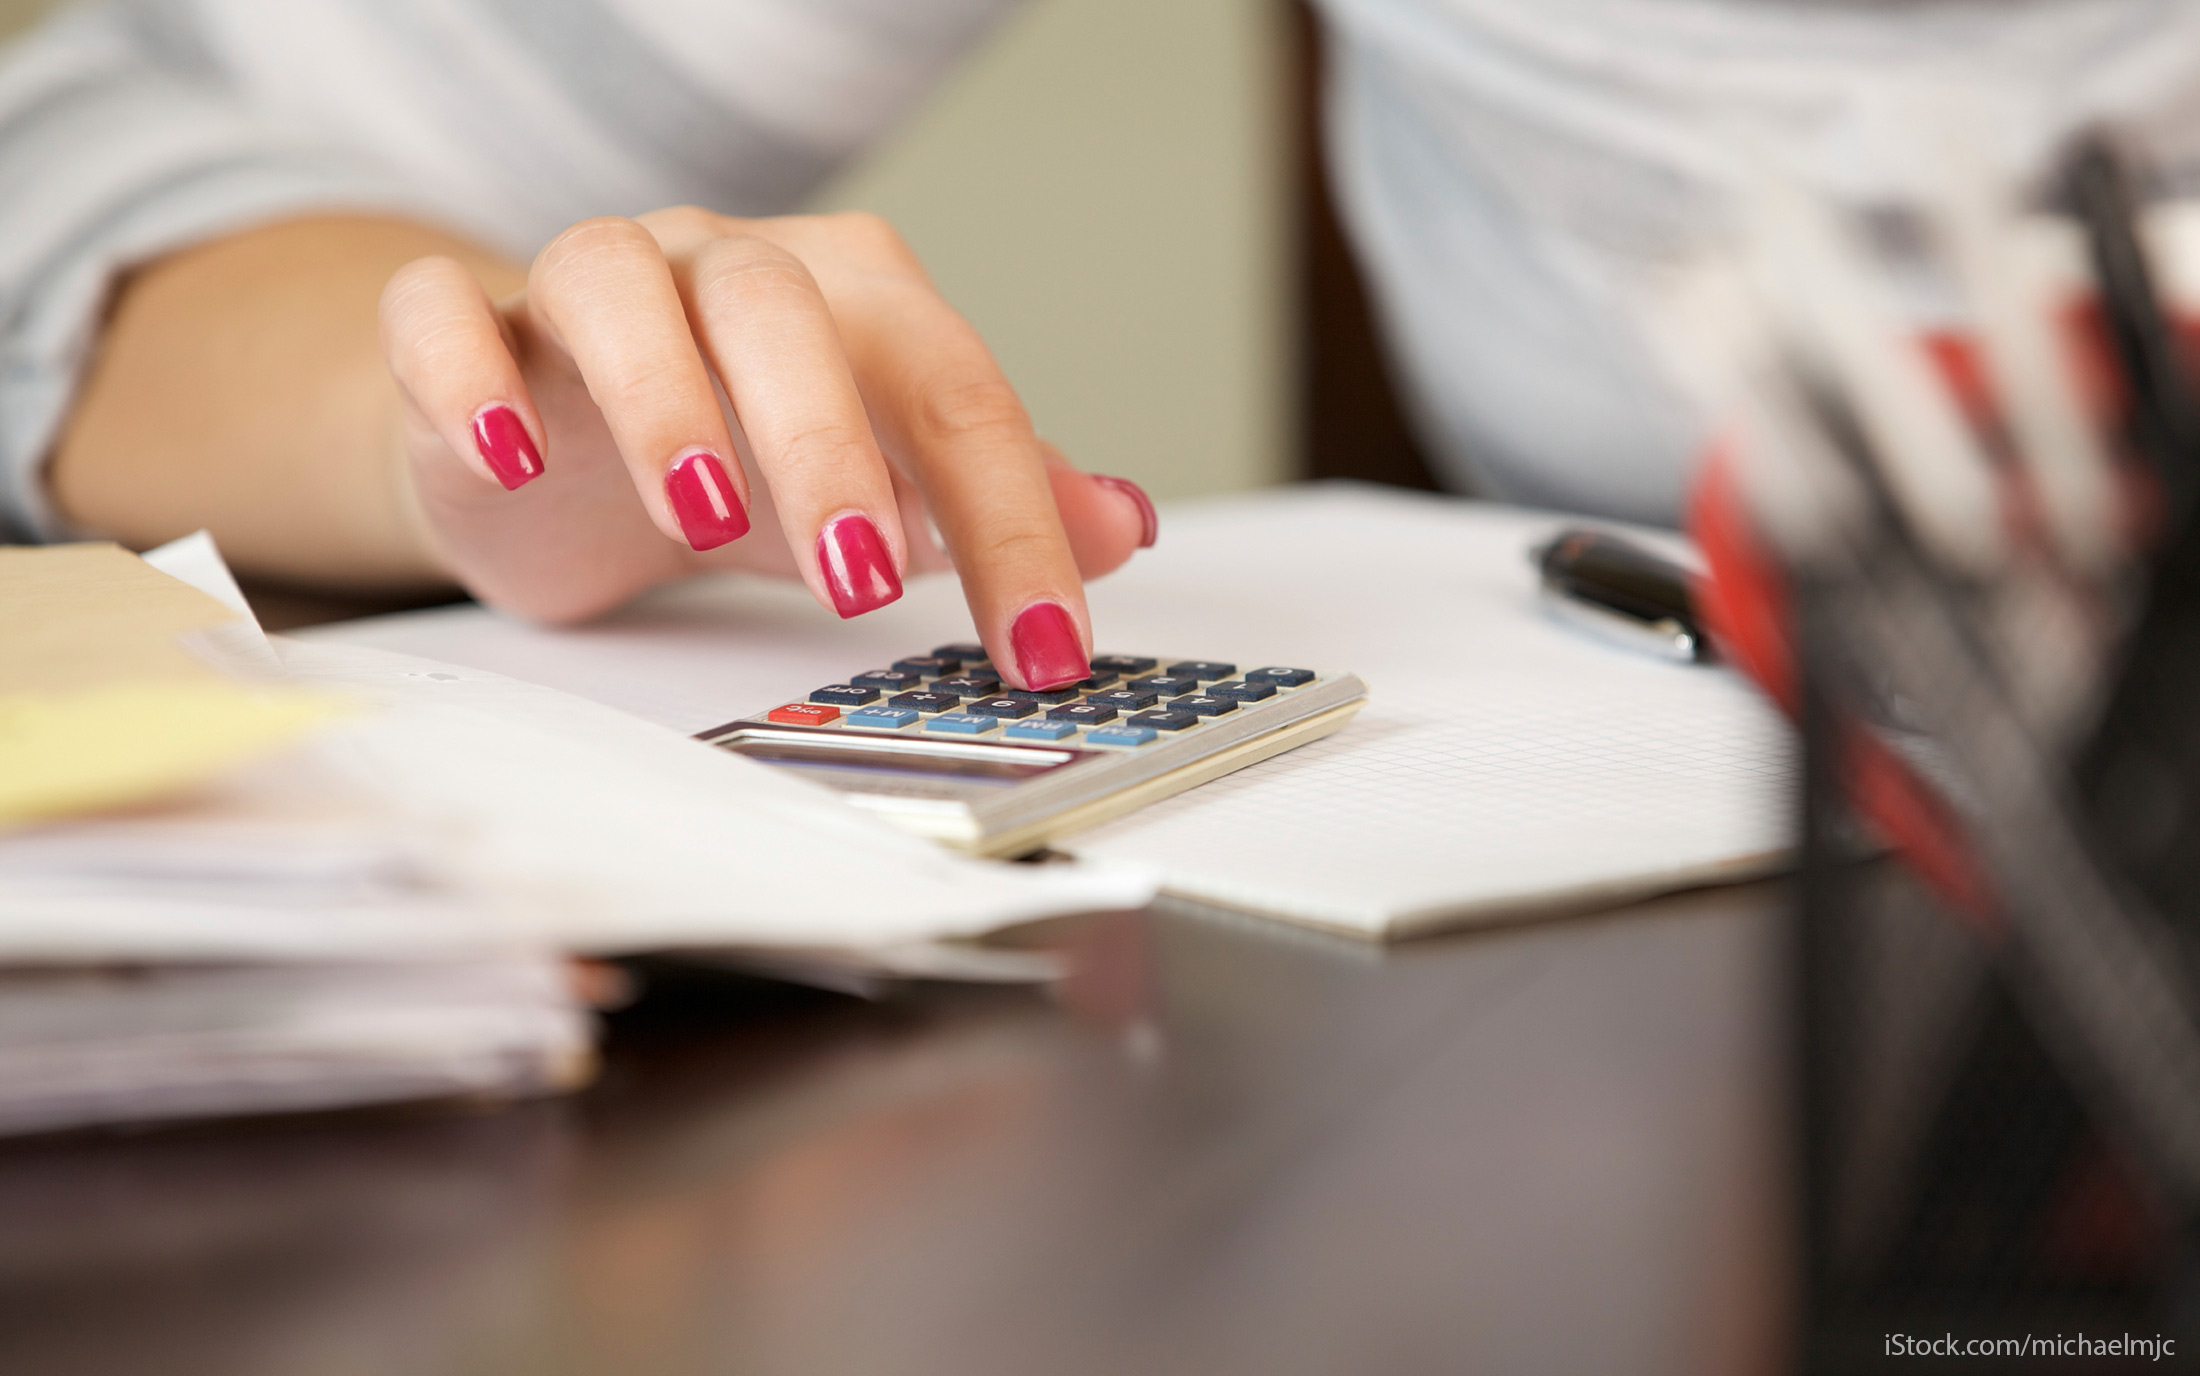 ramp up your savings